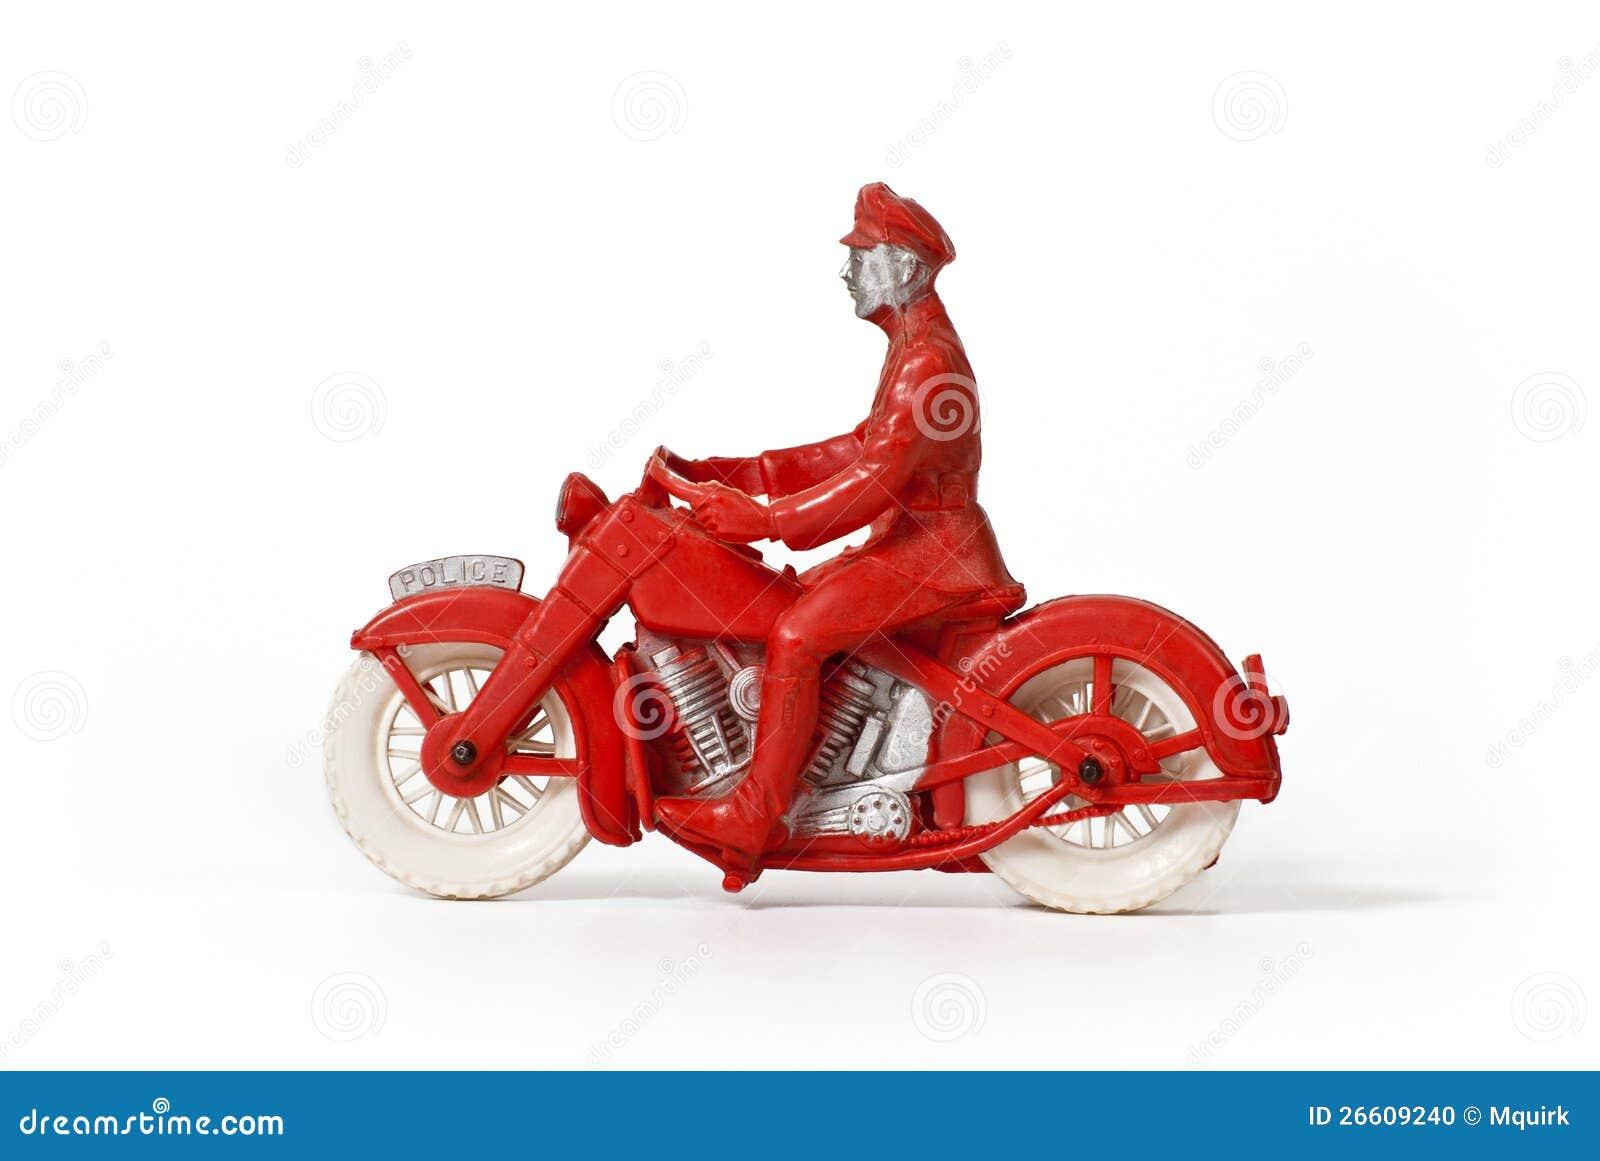 Vintage Toy Motorcycle Policeman Stock Photo Image 26609240